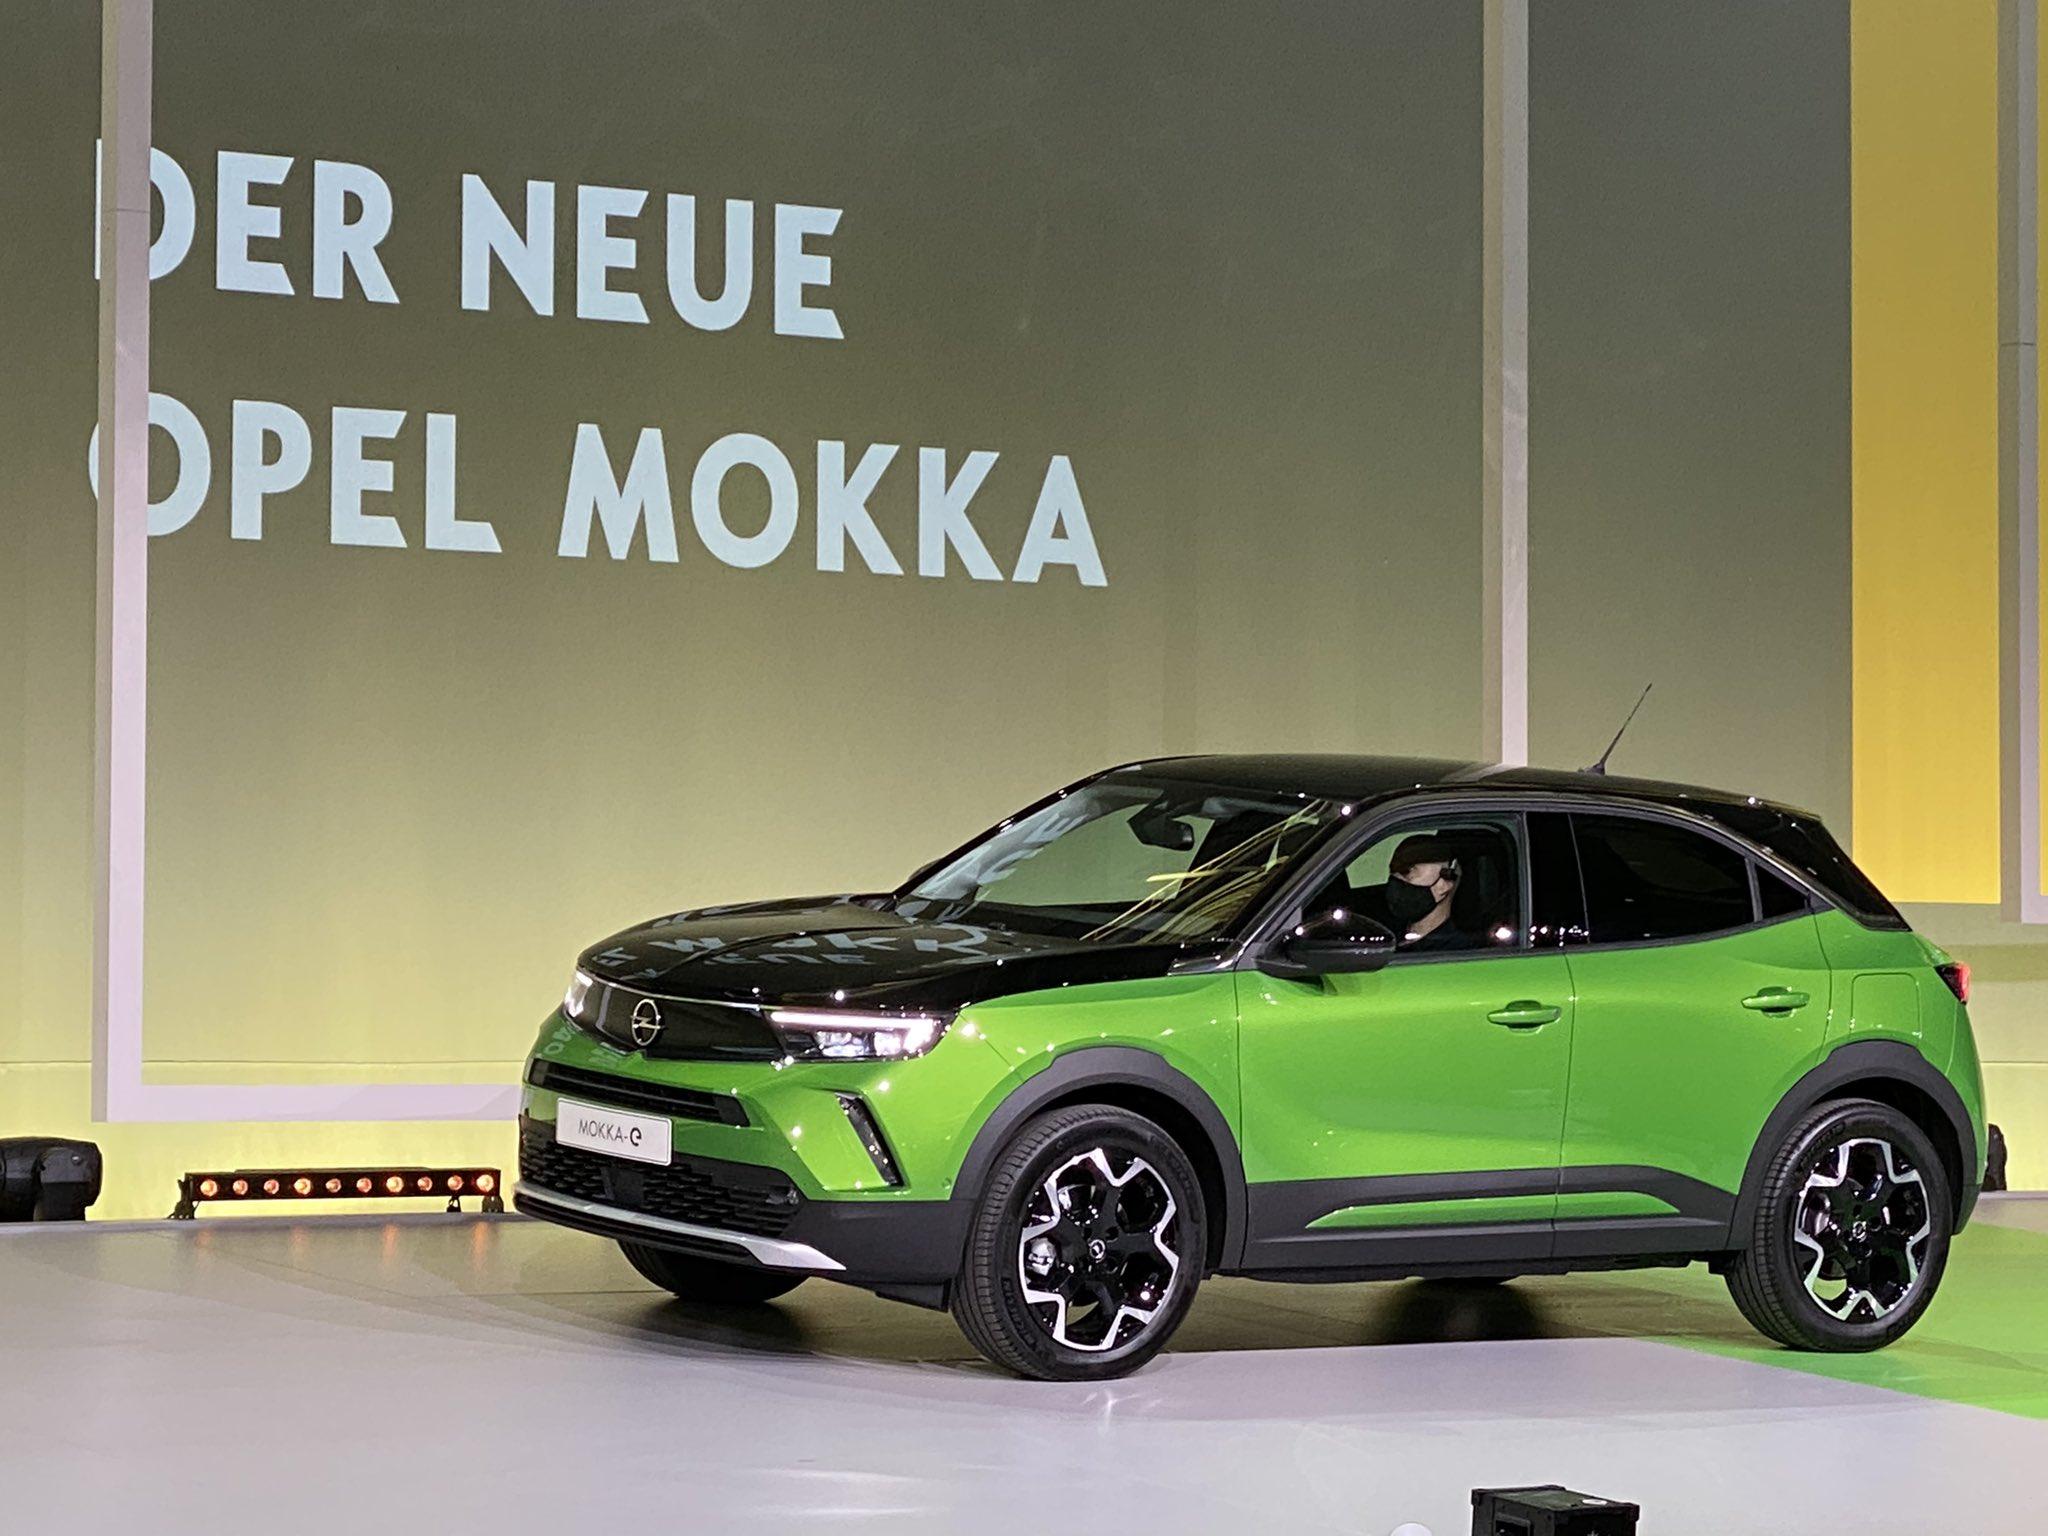 2020 - [Opel] Mokka II [P2QO] Eigsx9MX0AAtBTo?format=jpg&name=large